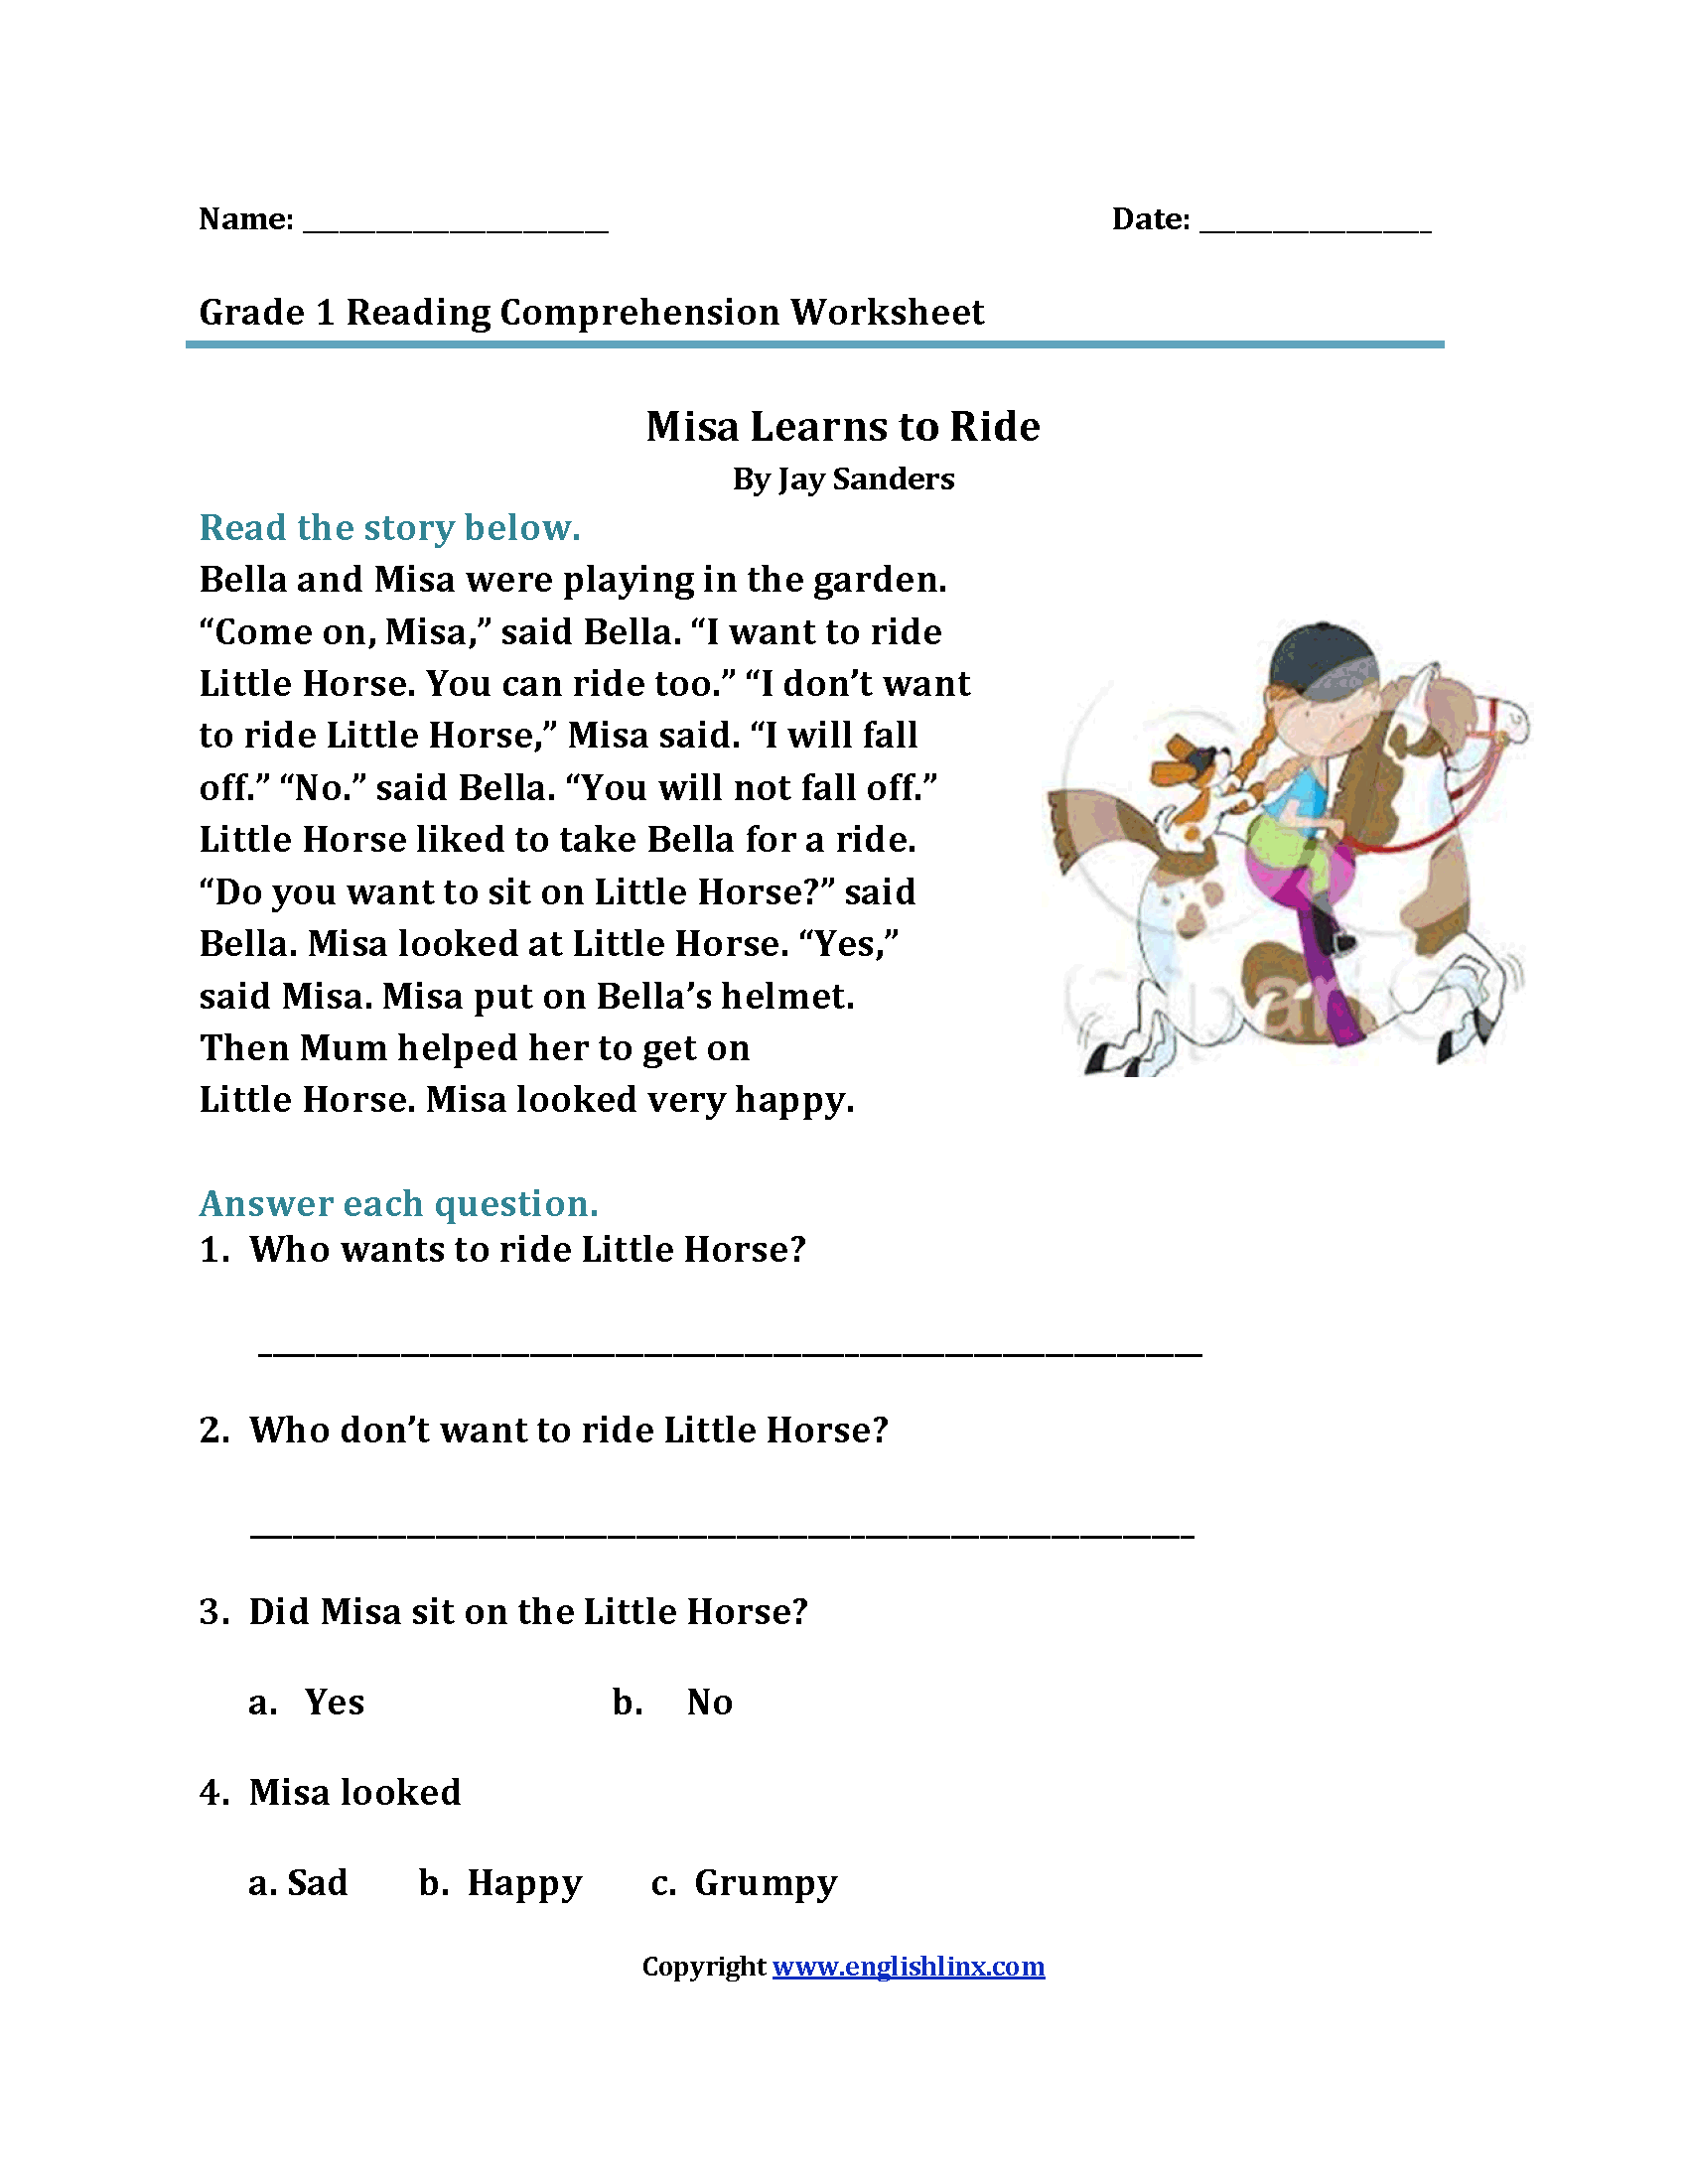 hight resolution of Misa Learns to Ride\u003cbr\u003eFirst Grade Reading Worksheets   Reading  comprehension worksheets